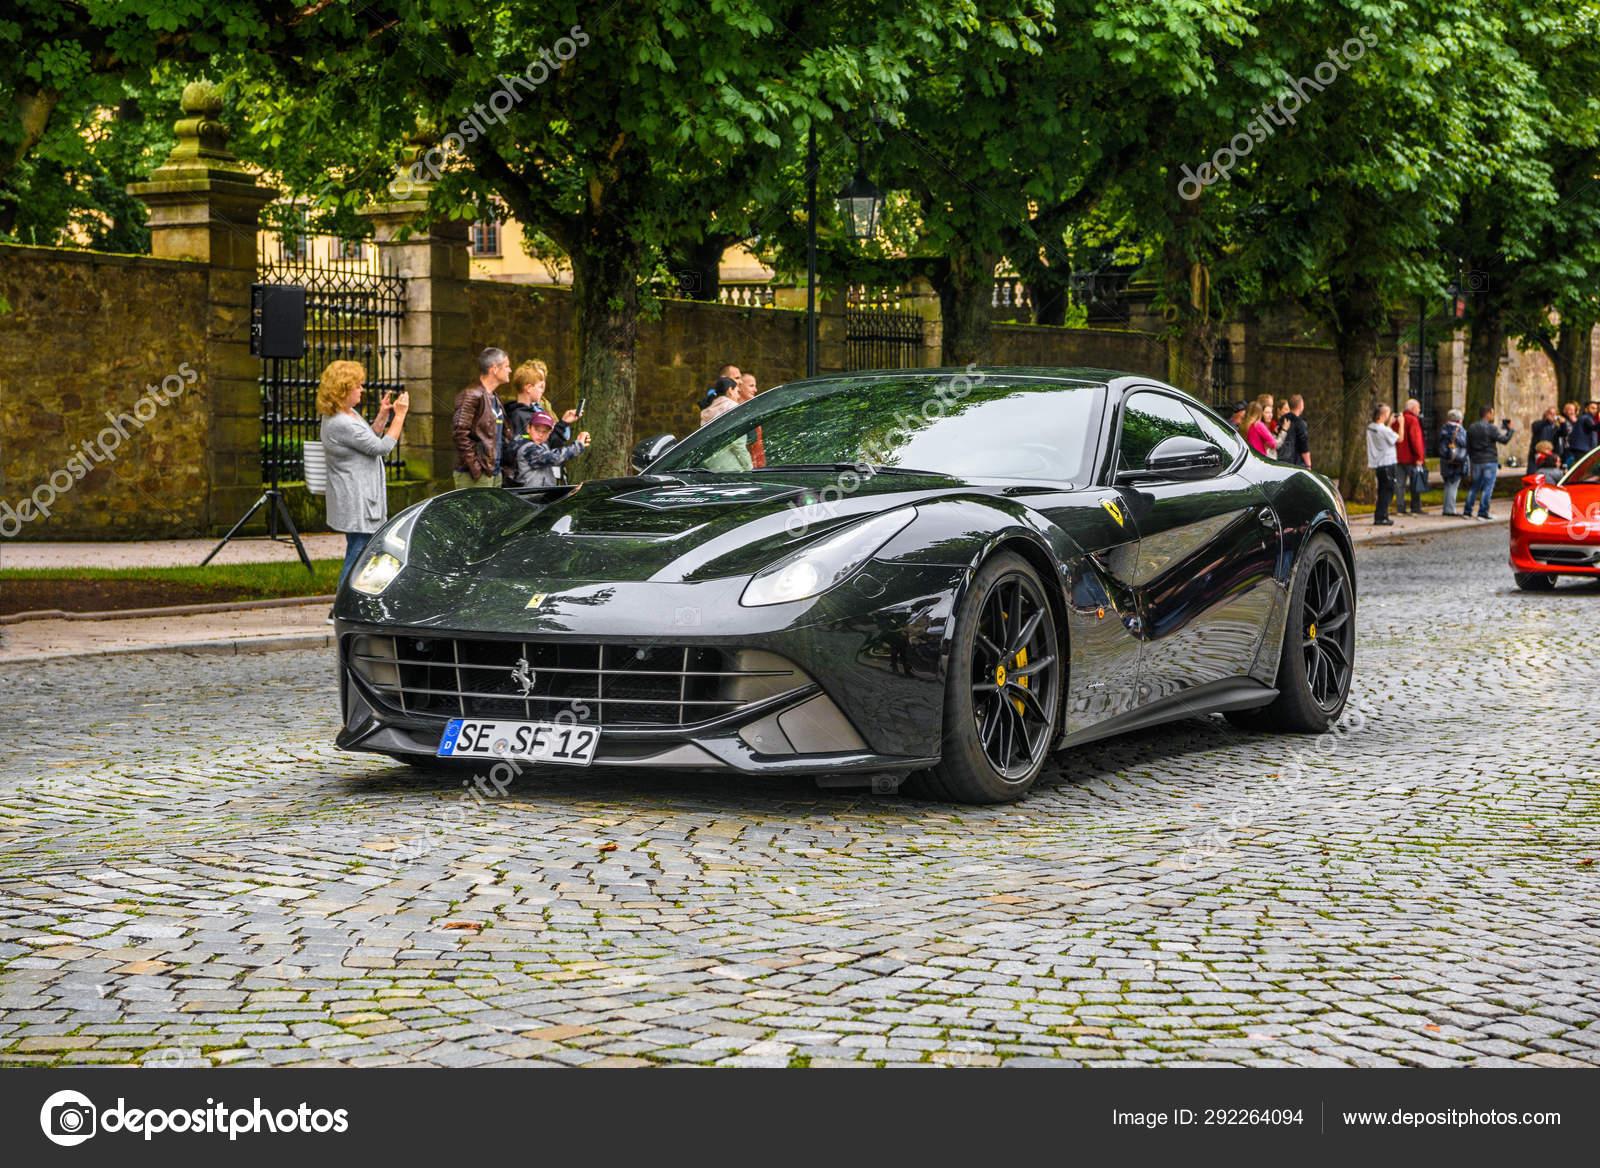 Germany Fulda Jul 2019 Dark Gray Ferrari F12 Berlinetta Coup Stock Editorial Photo Eagle2308 292264094